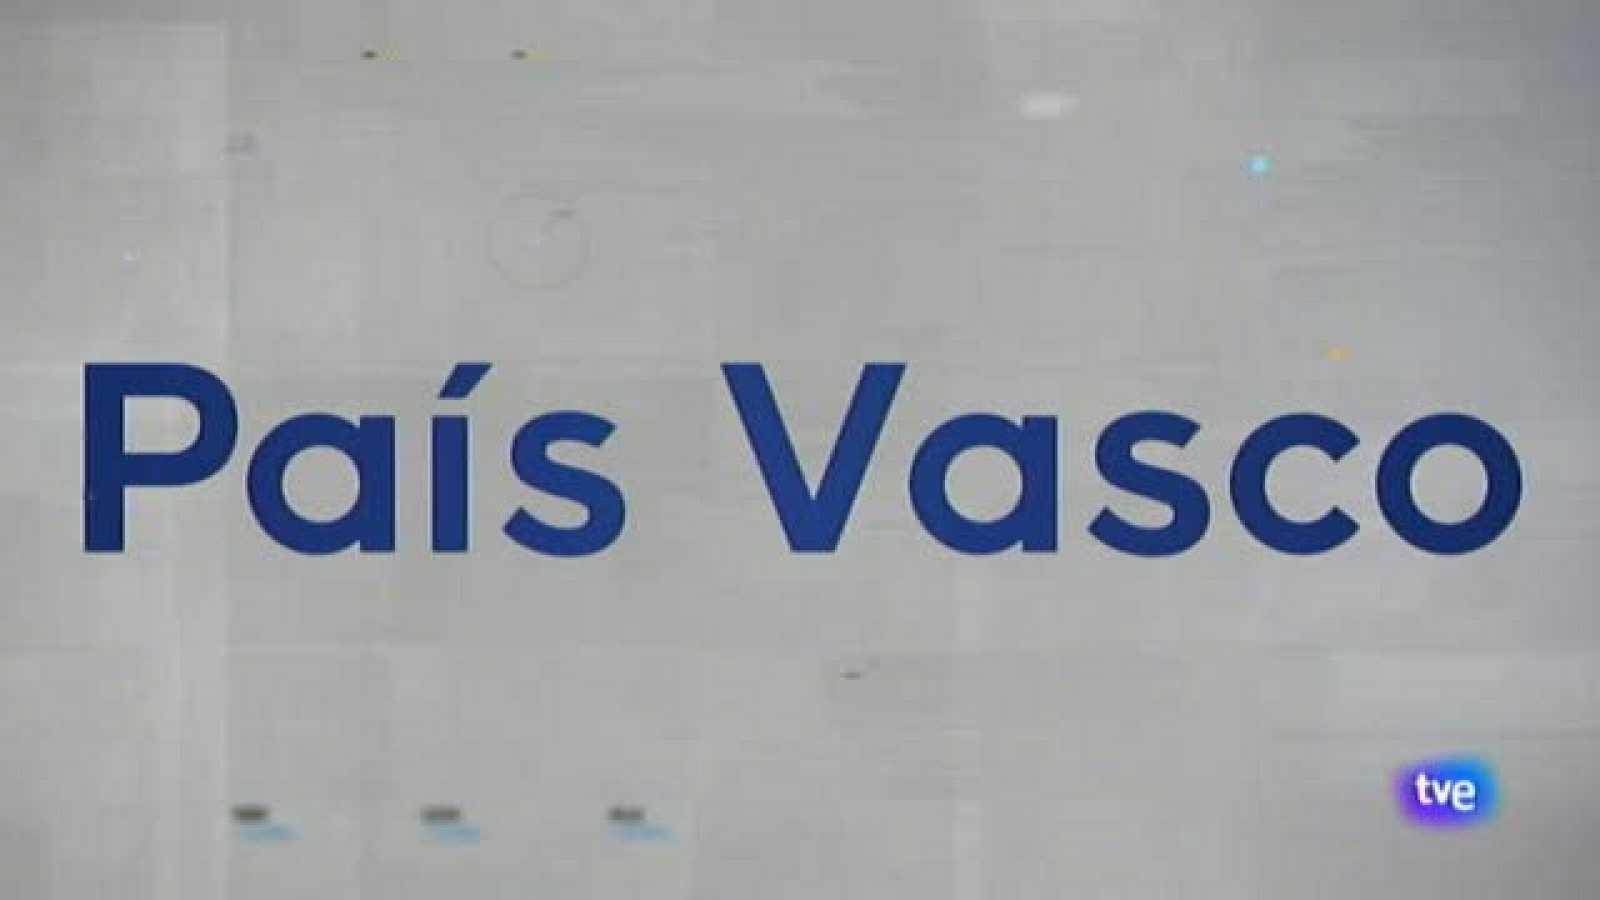 Telenorte País Vasco 20/04/21